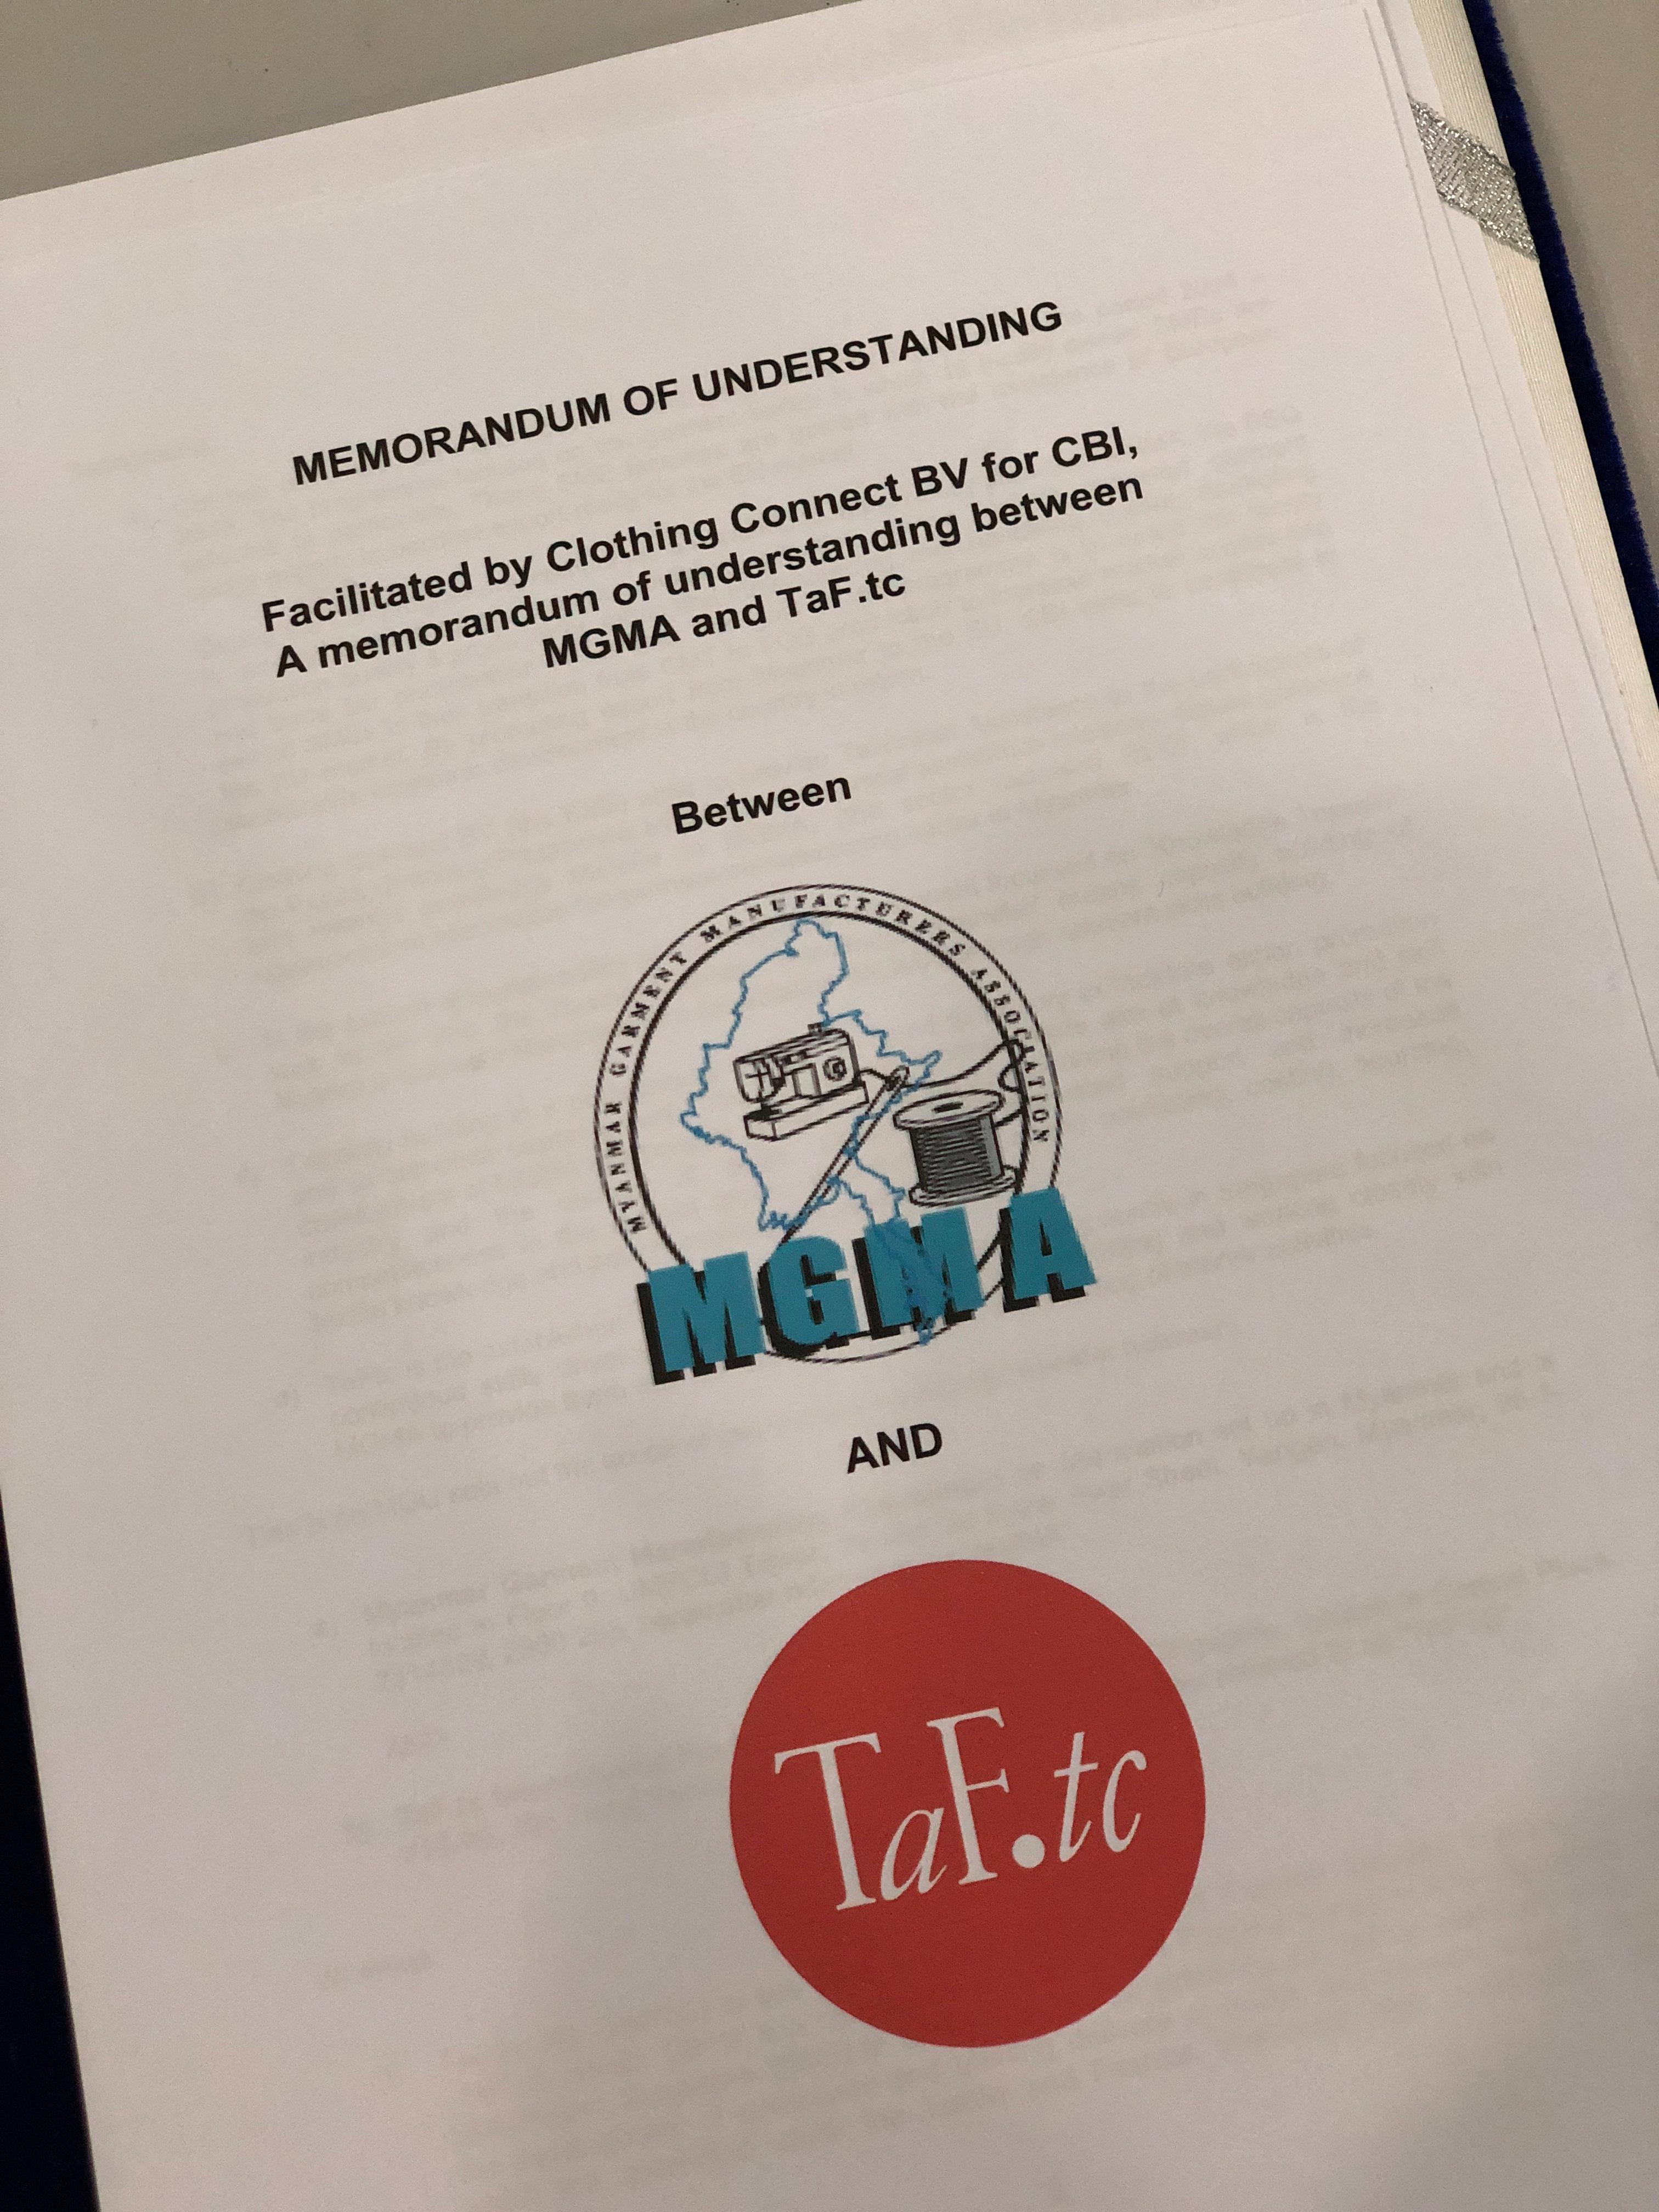 TaF.tc, MGMA, and CBI sign an MOU